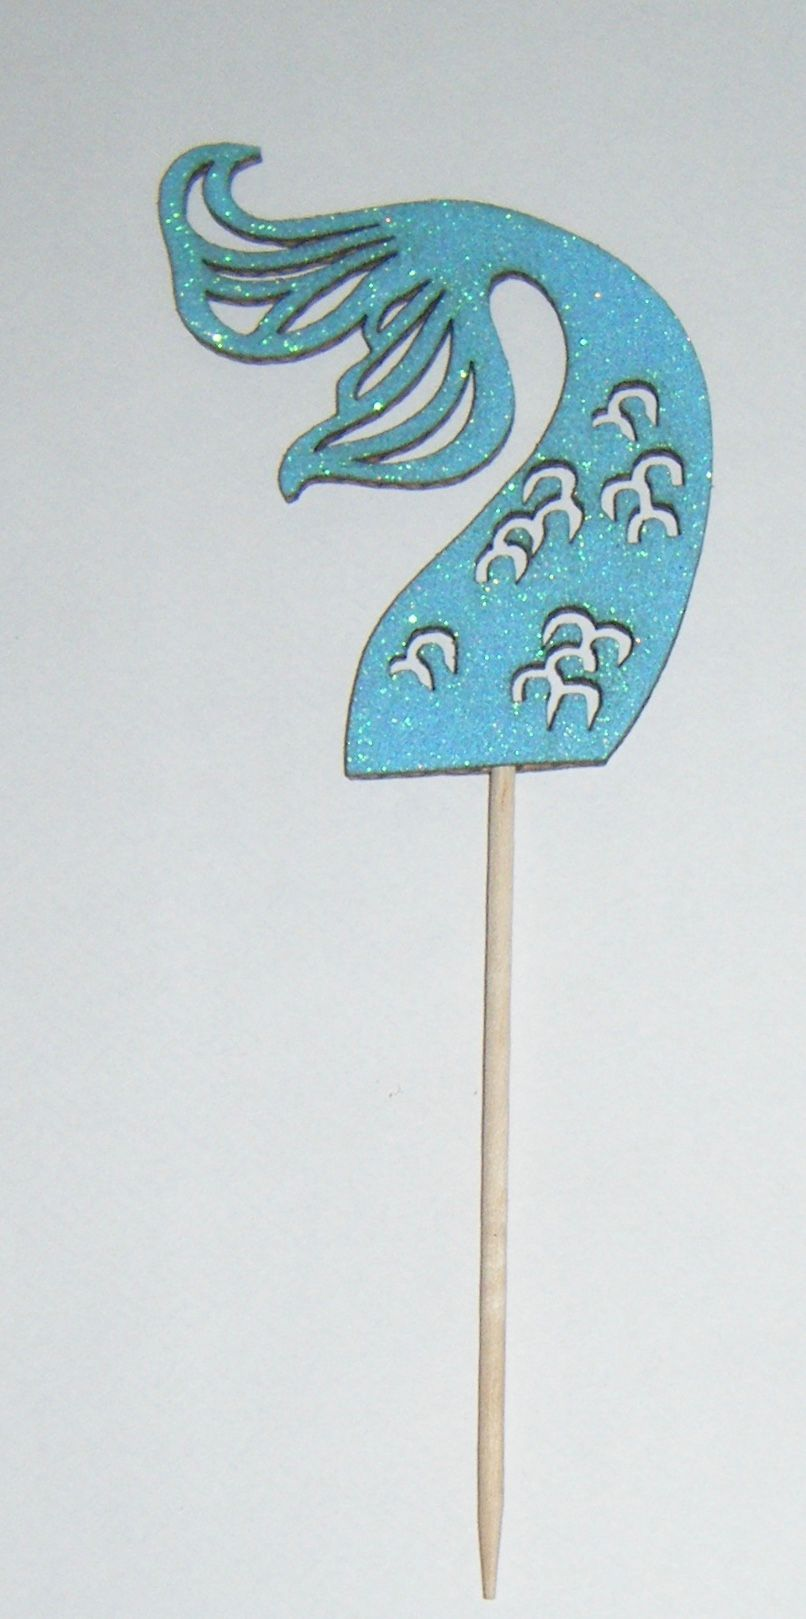 Glitter or Plain Card Mermaid Tail 2 Silhouette cake picks